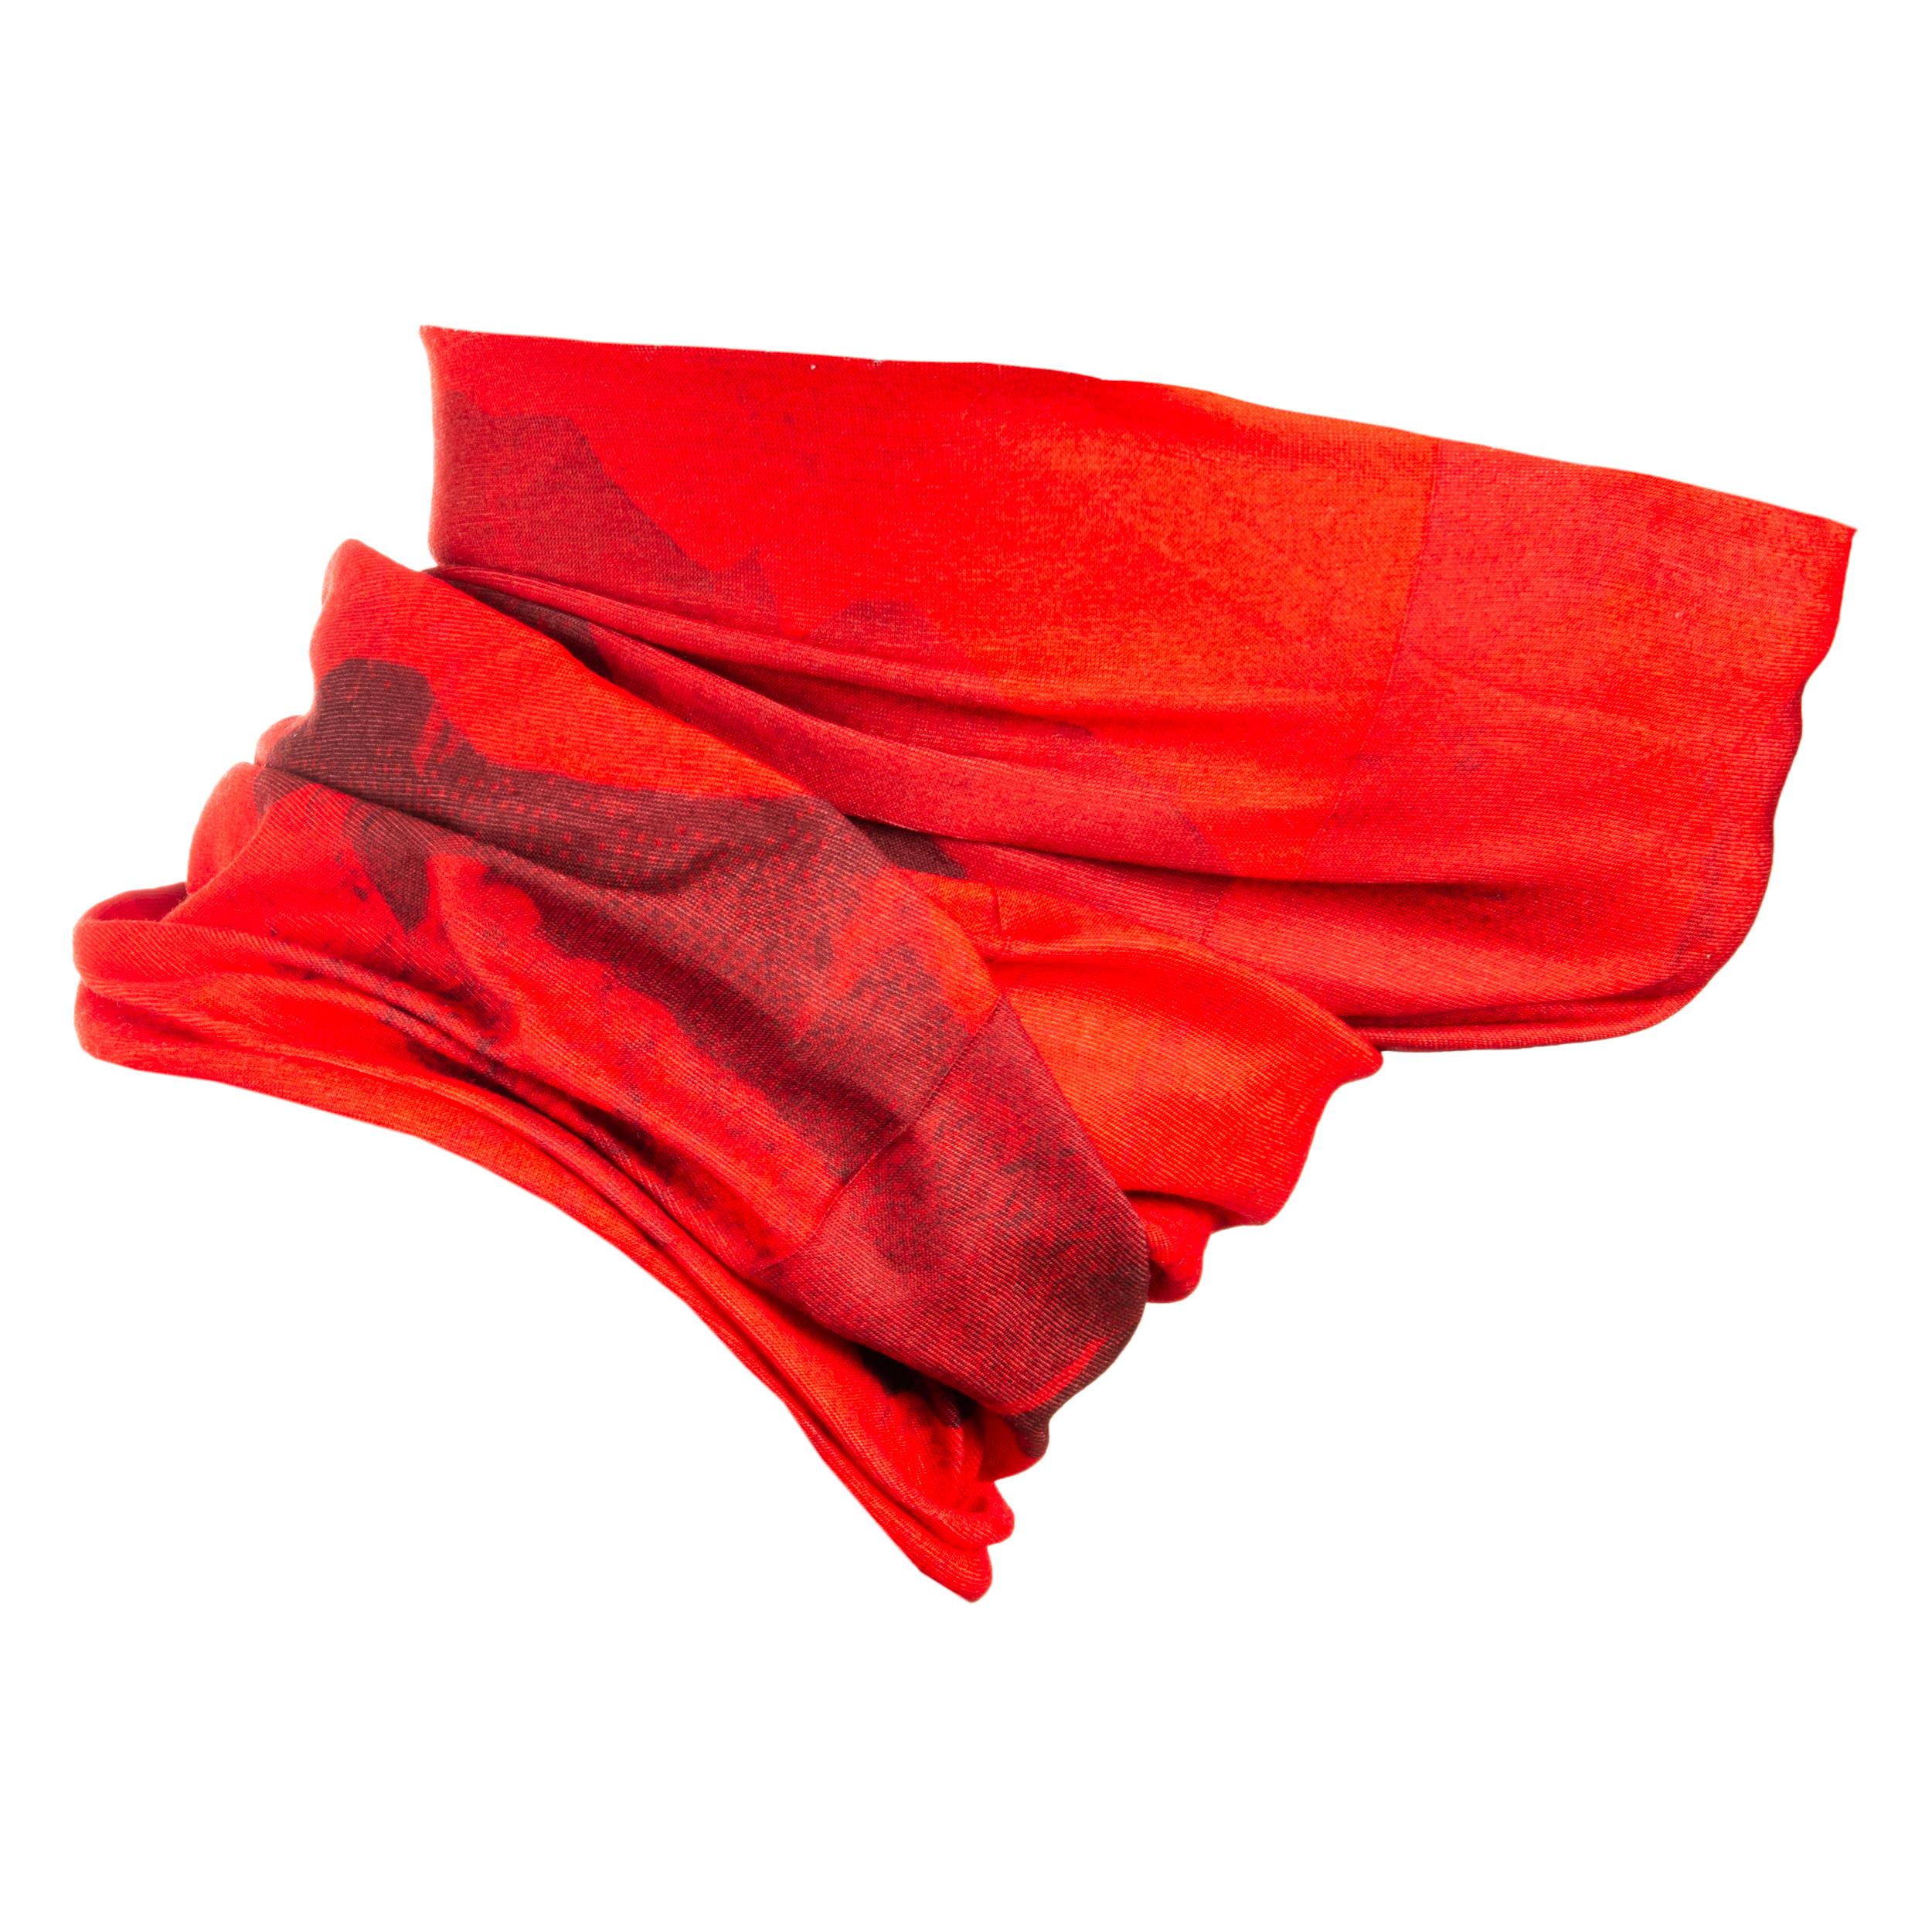 Guler ROADR 100 Roșu/ Bordo imagine produs